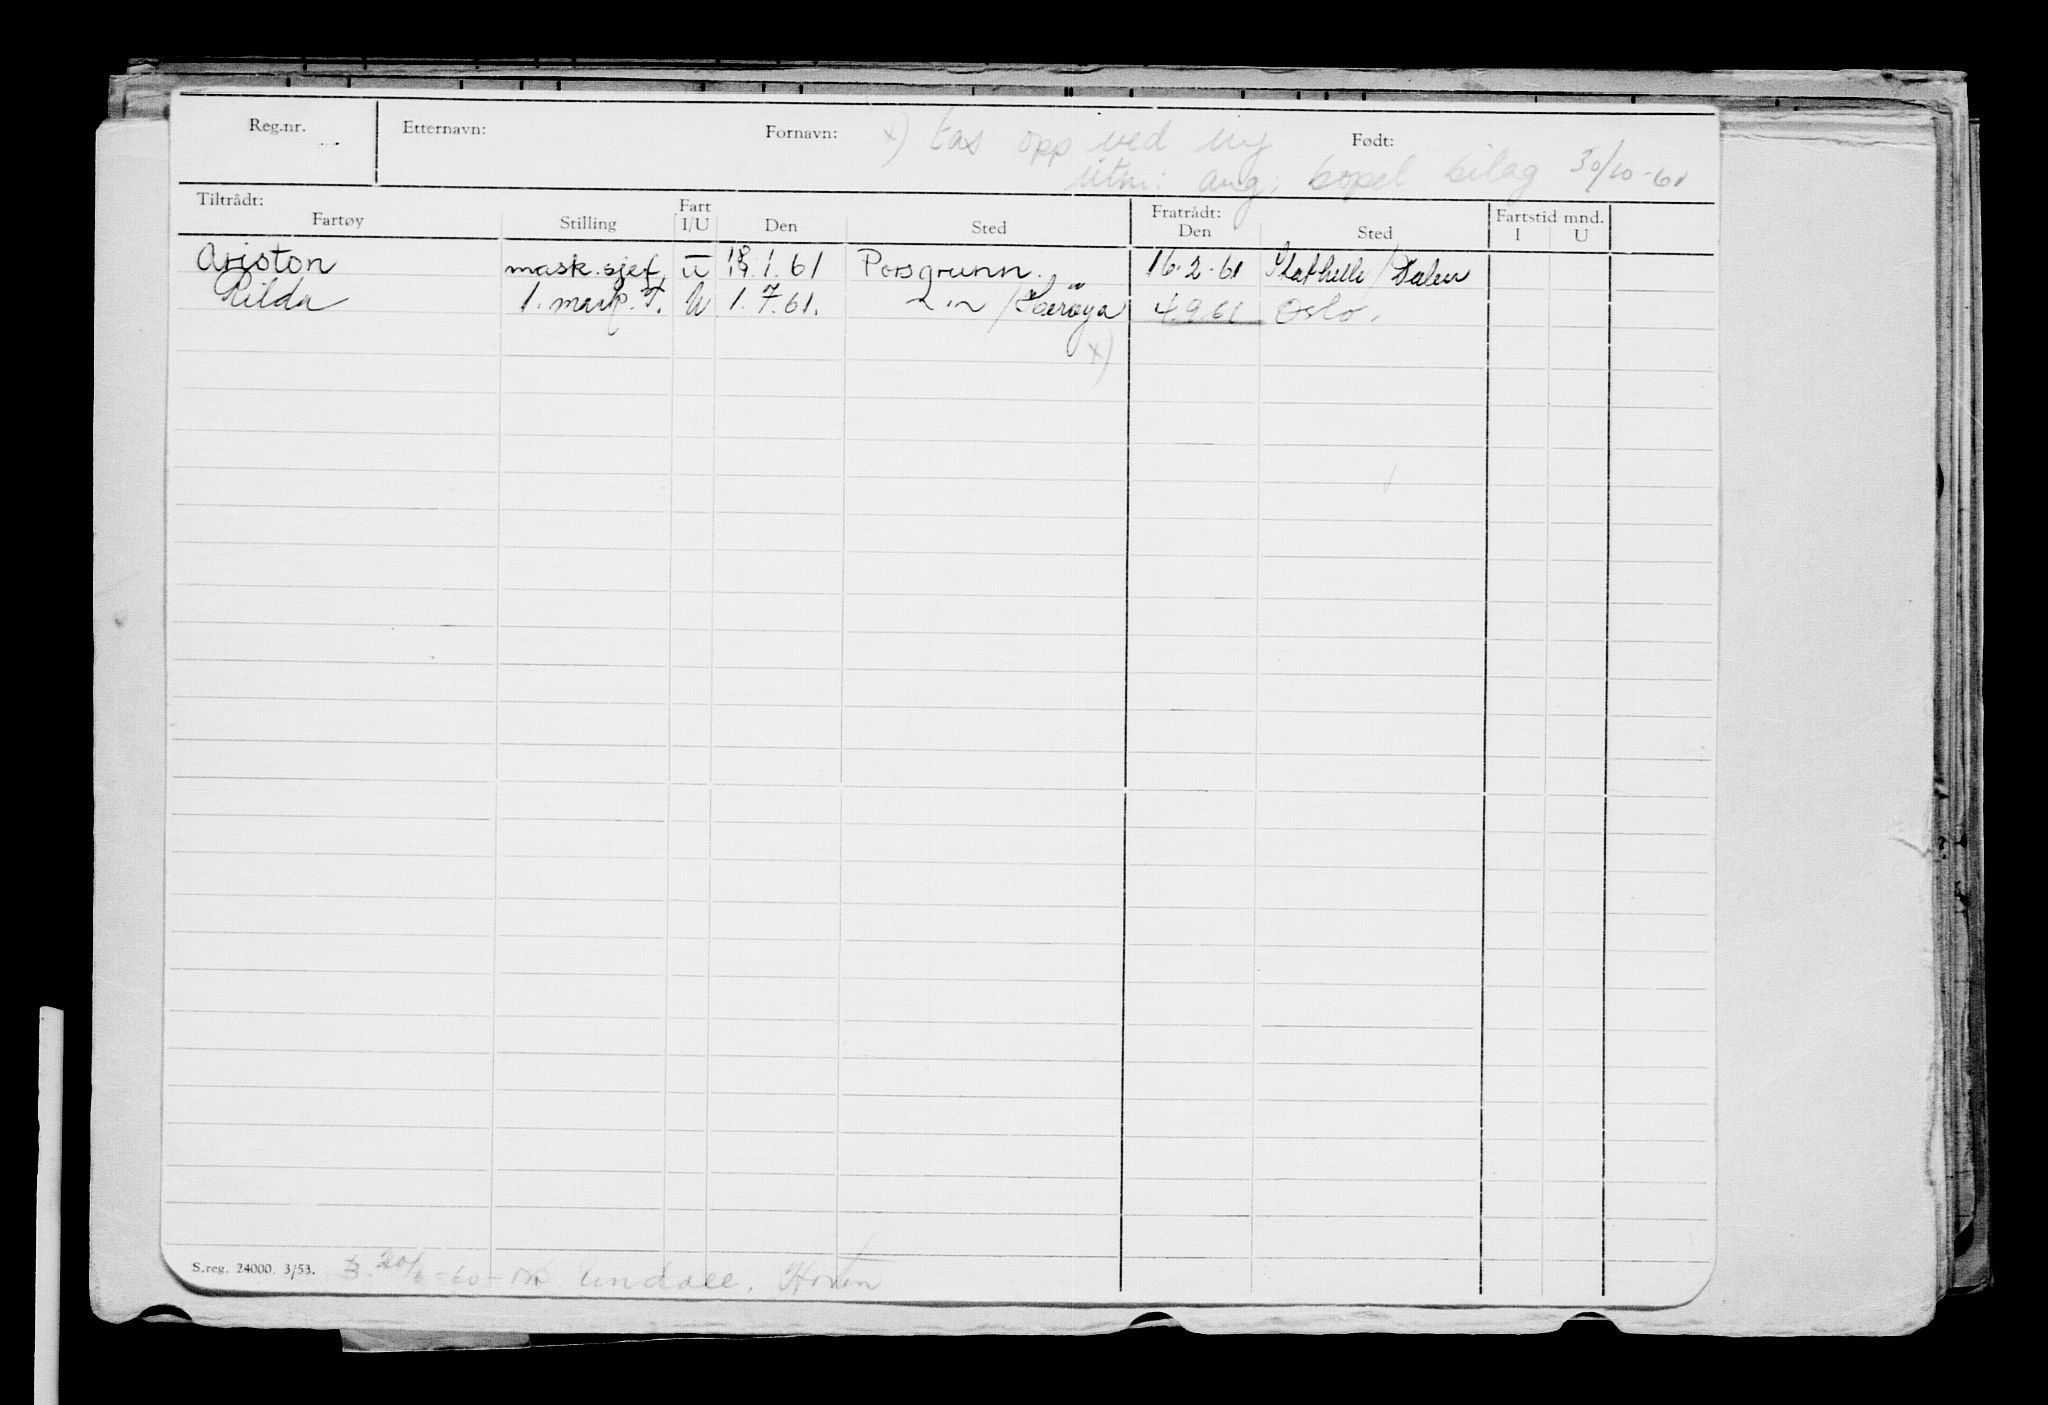 RA, Direktoratet for sjømenn, G/Gb/L0028: Hovedkort, 1898, s. 2